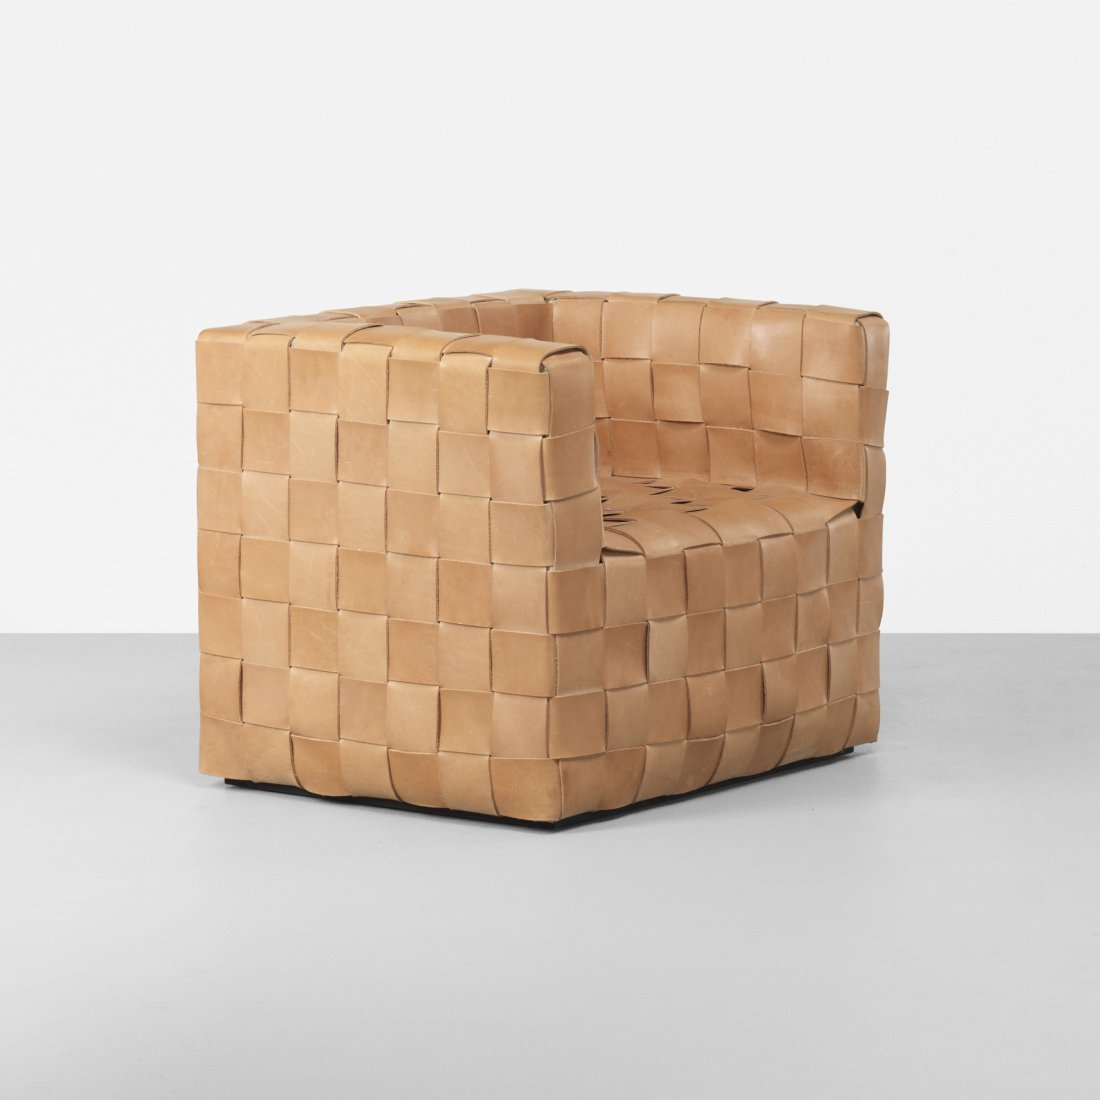 238: Gunnar Aagaard Andersen lounge chair